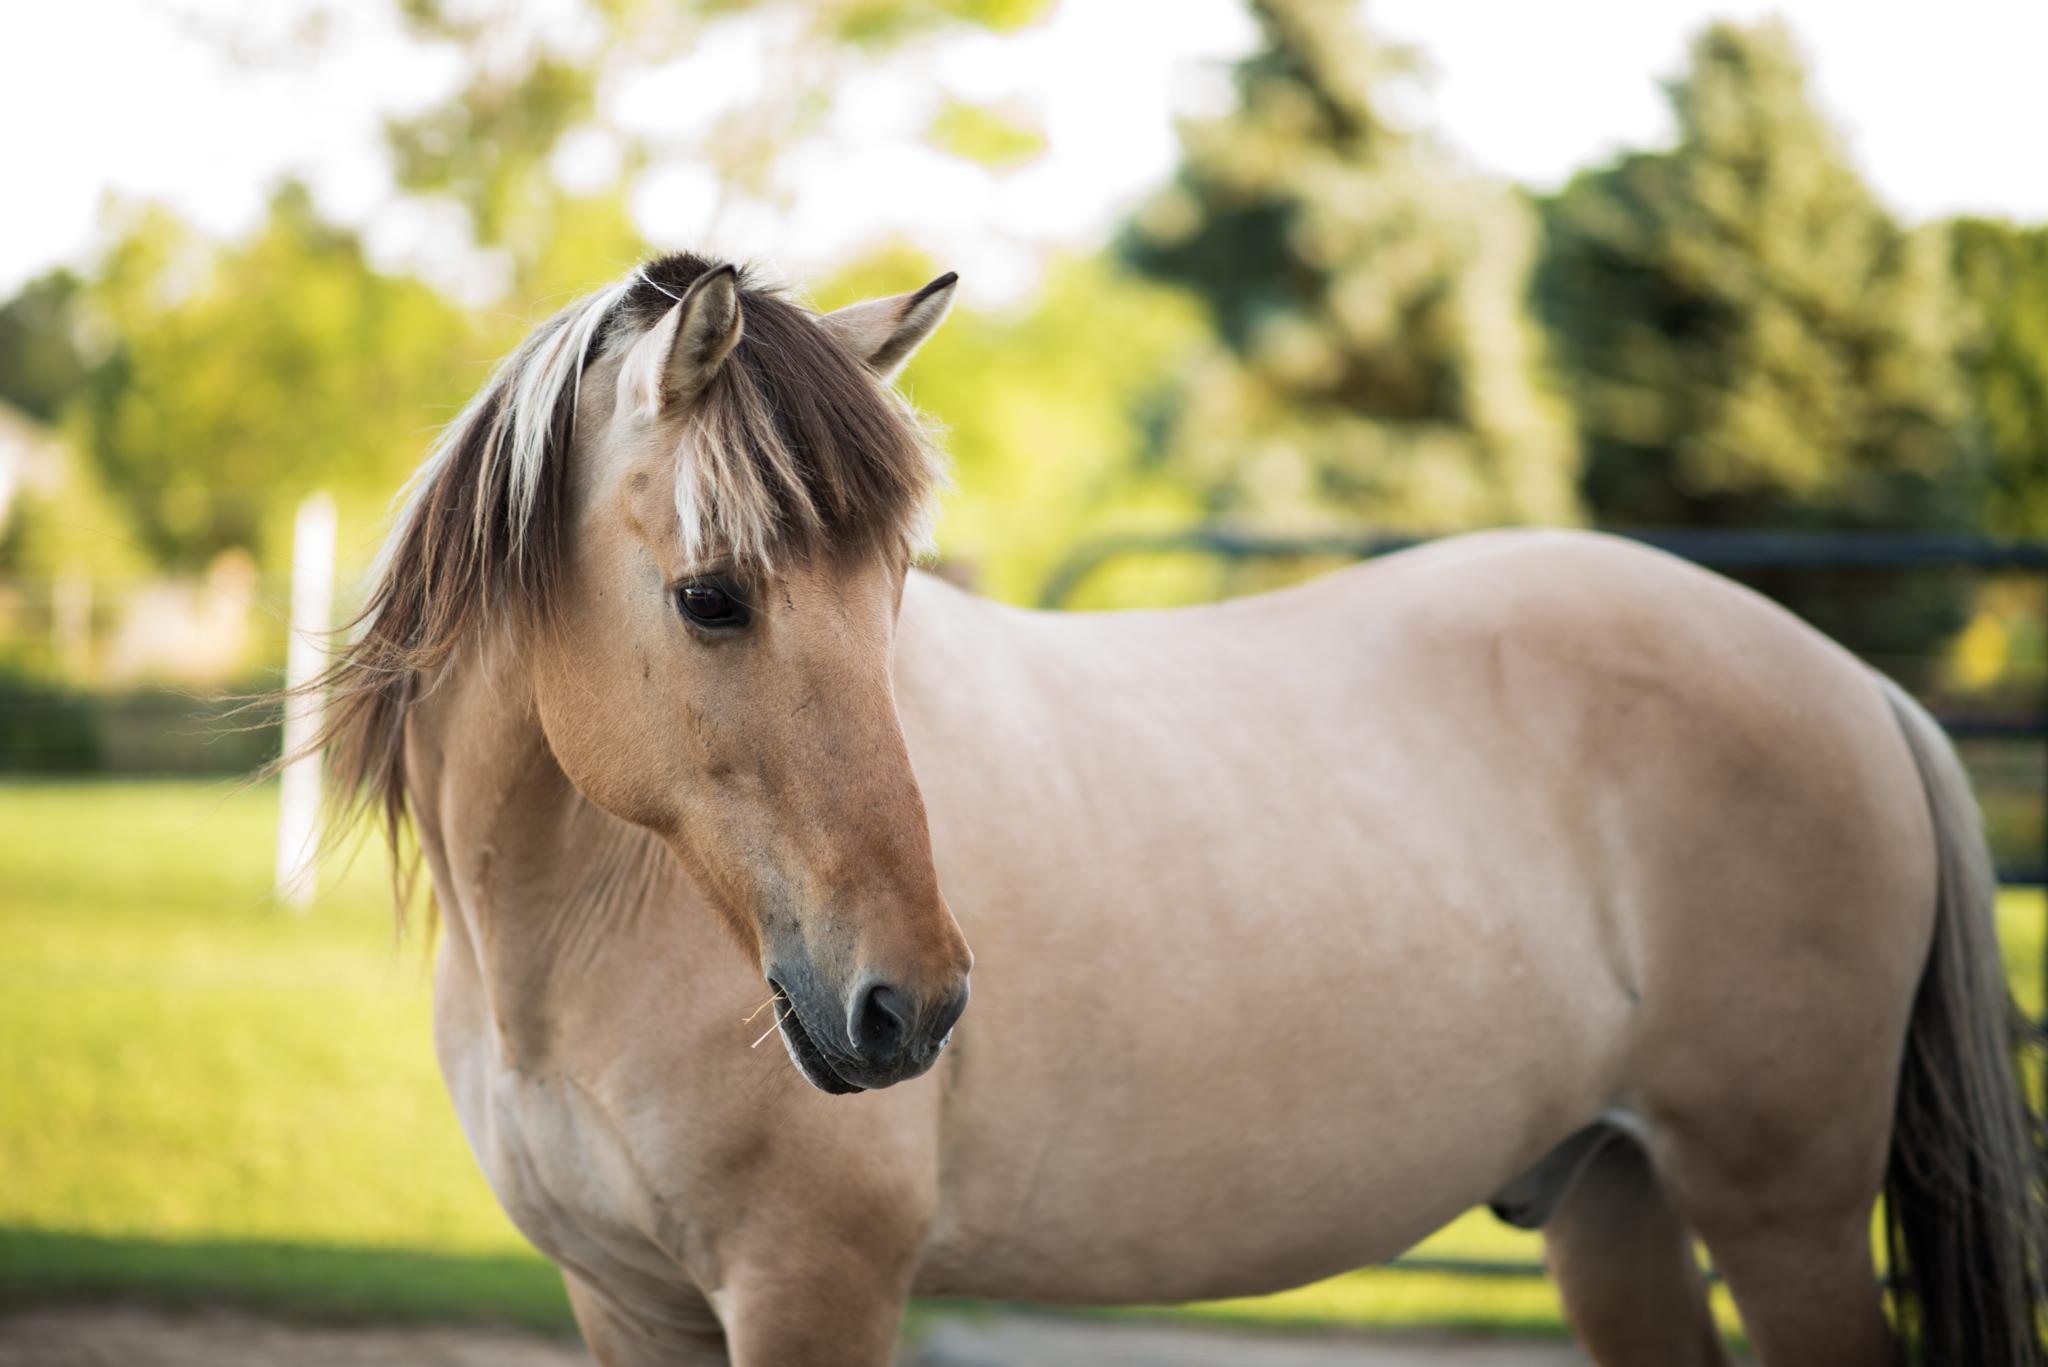 001_Horse_2016-08.jpg